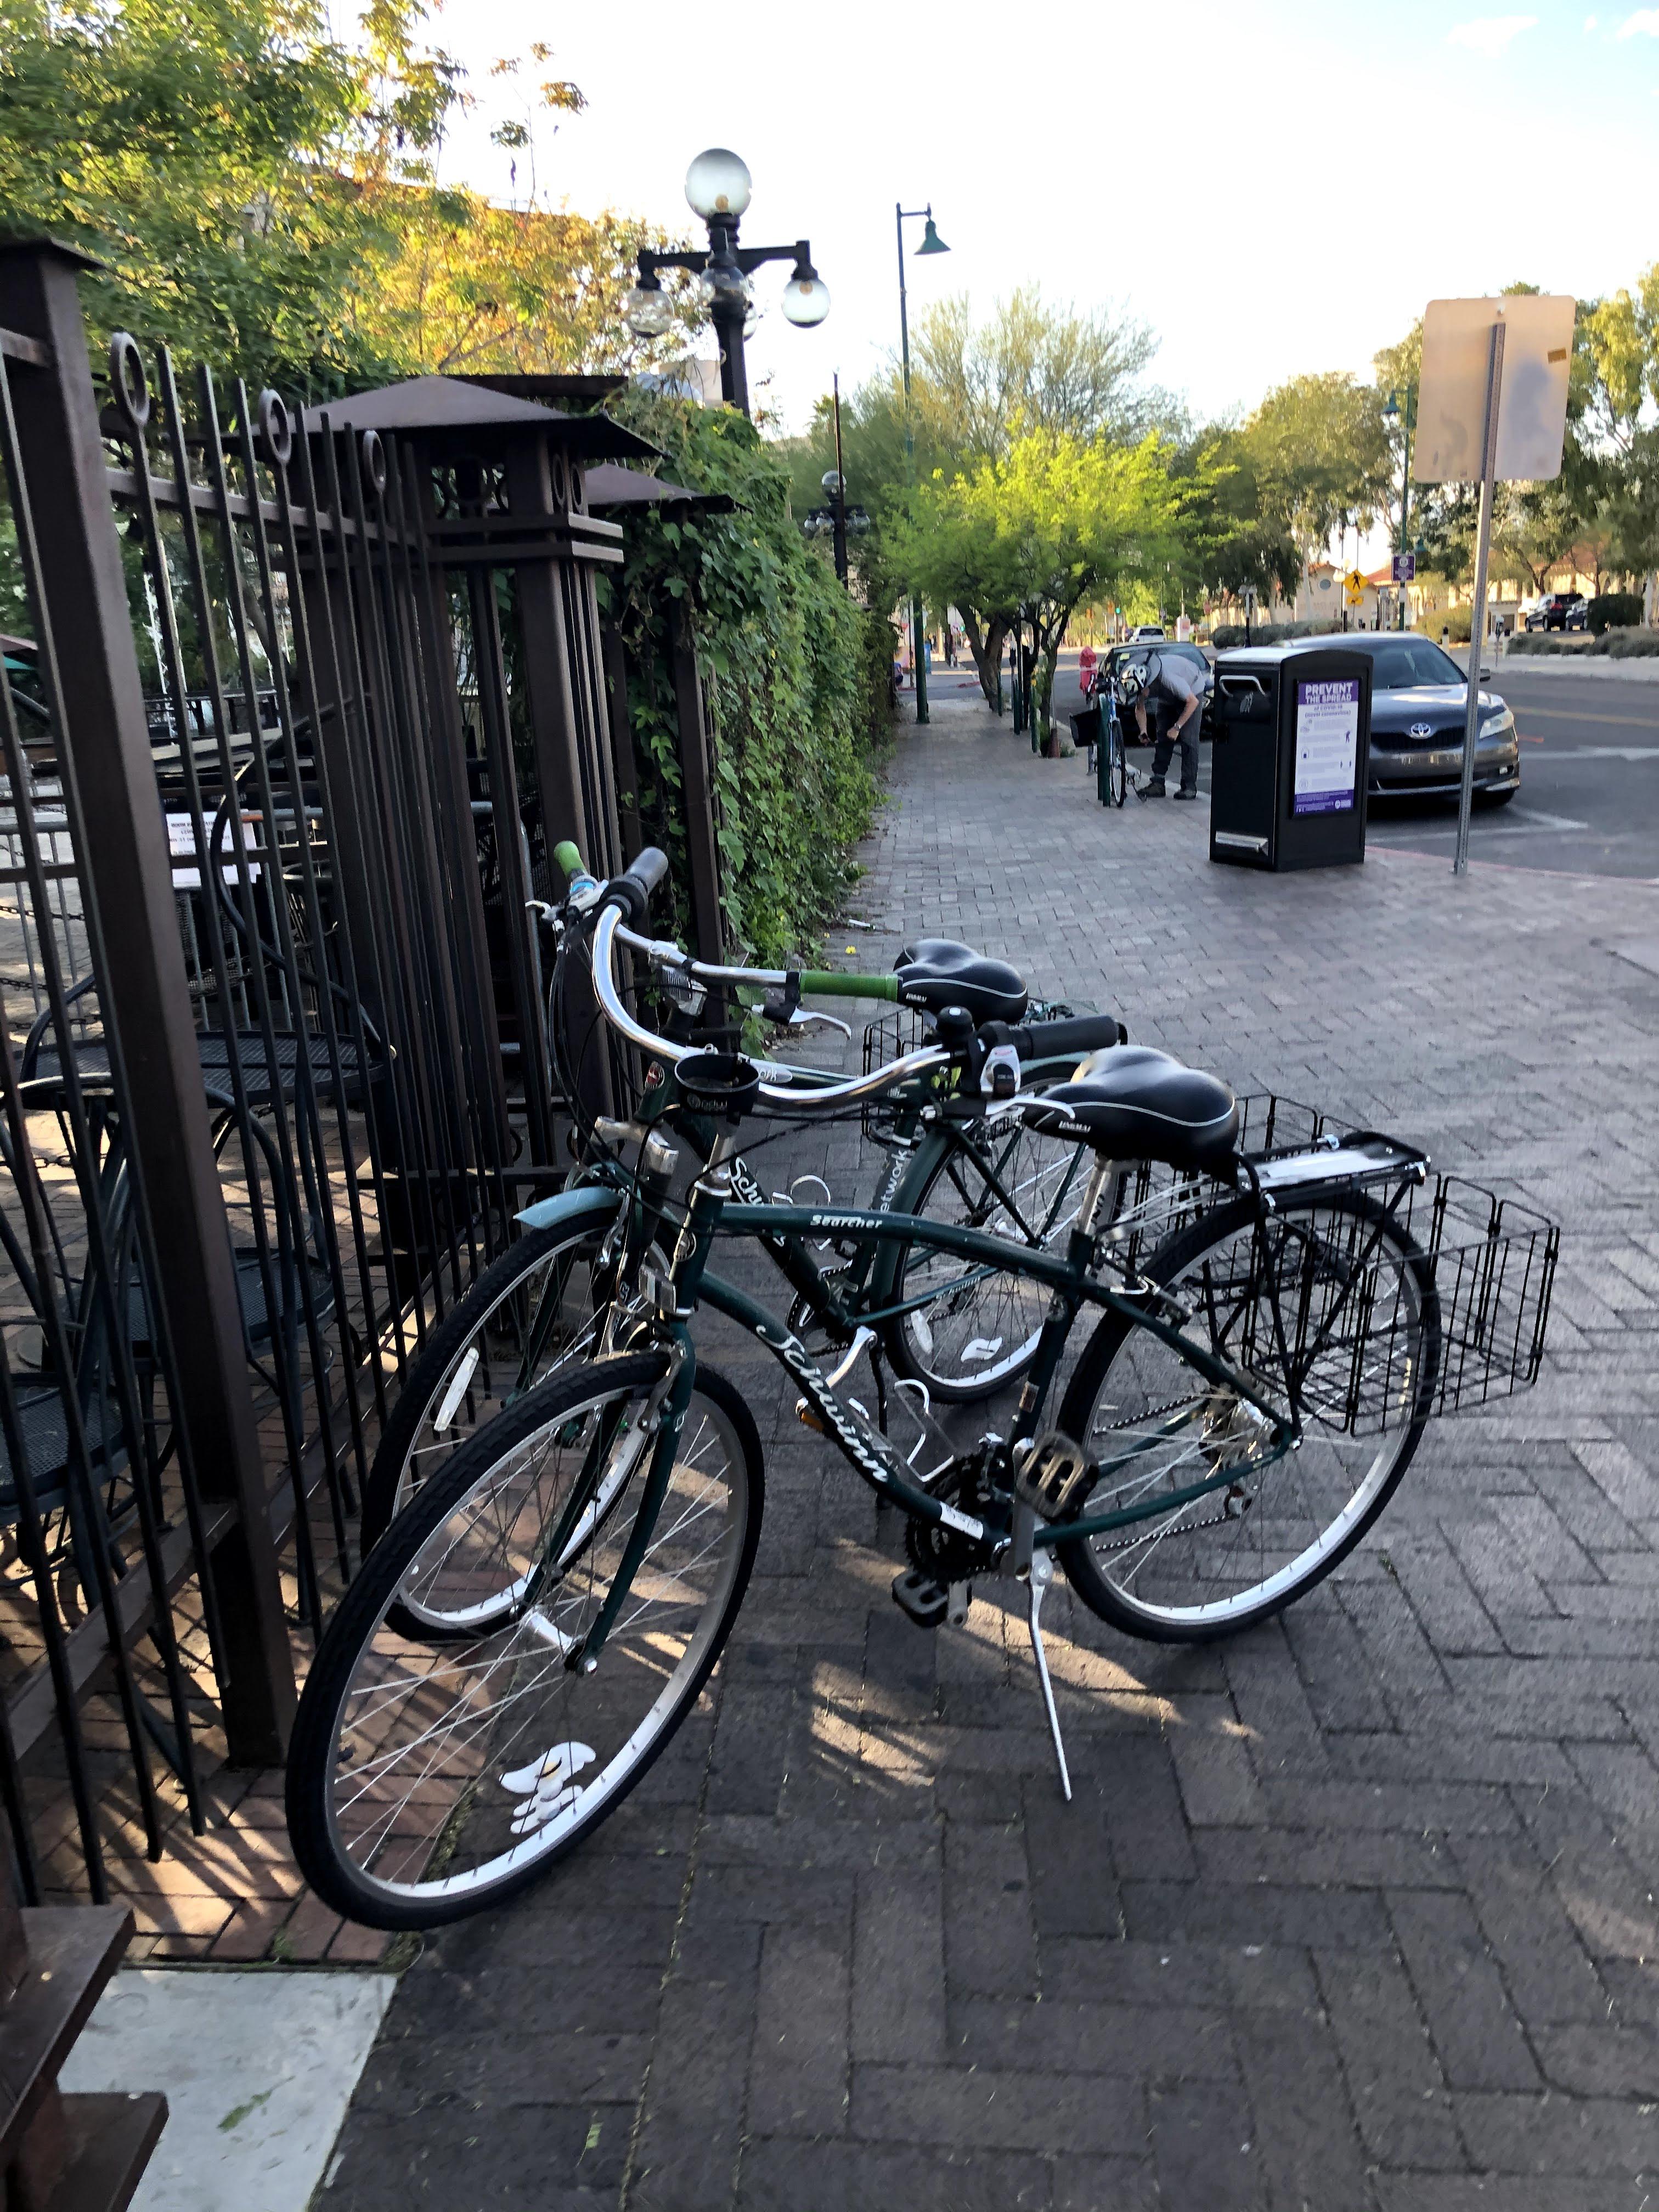 2 green bikes with baskets, near a gate